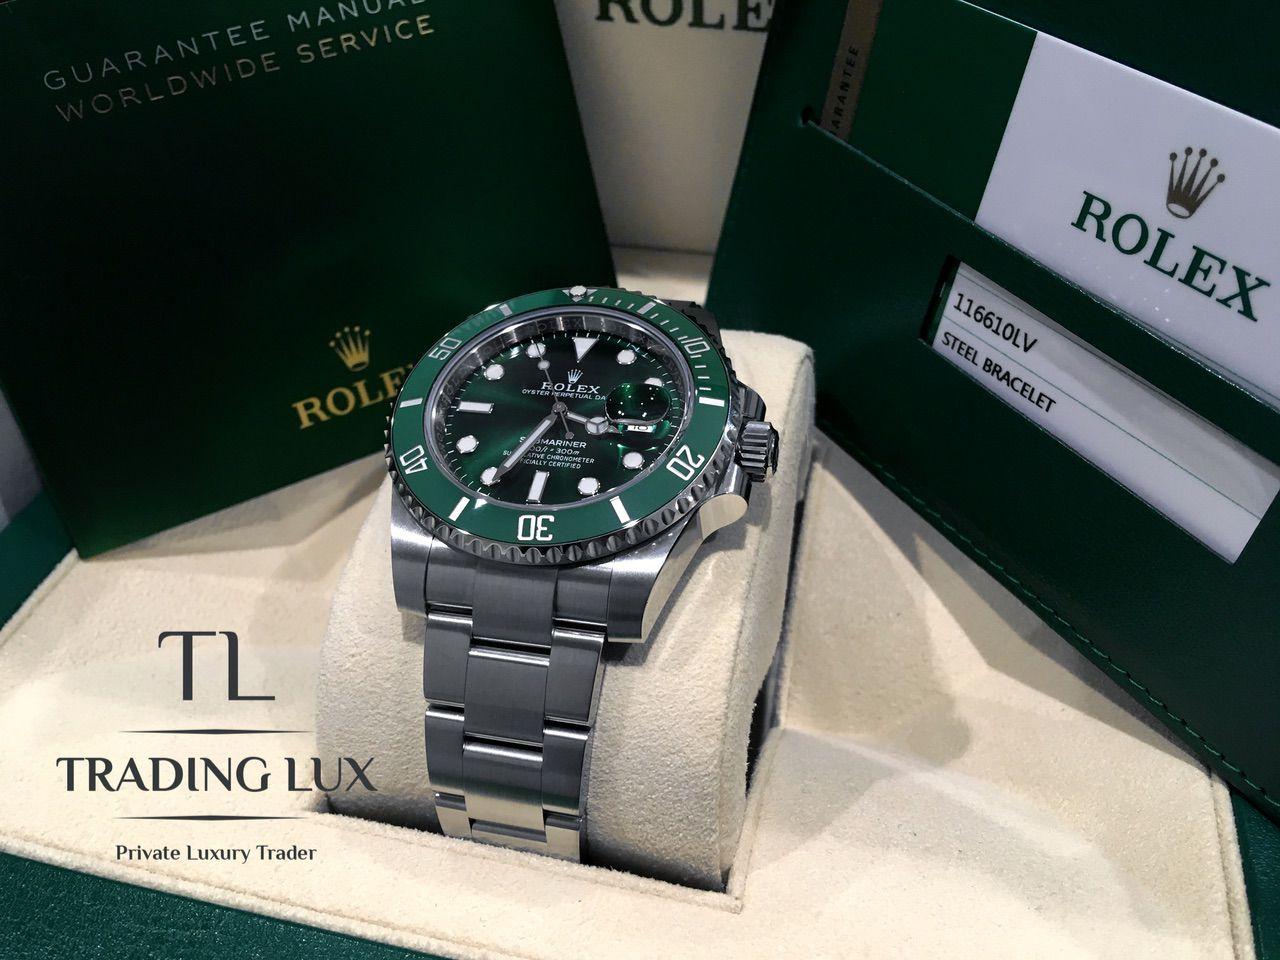 Rolex-116610LV-Hulk-9